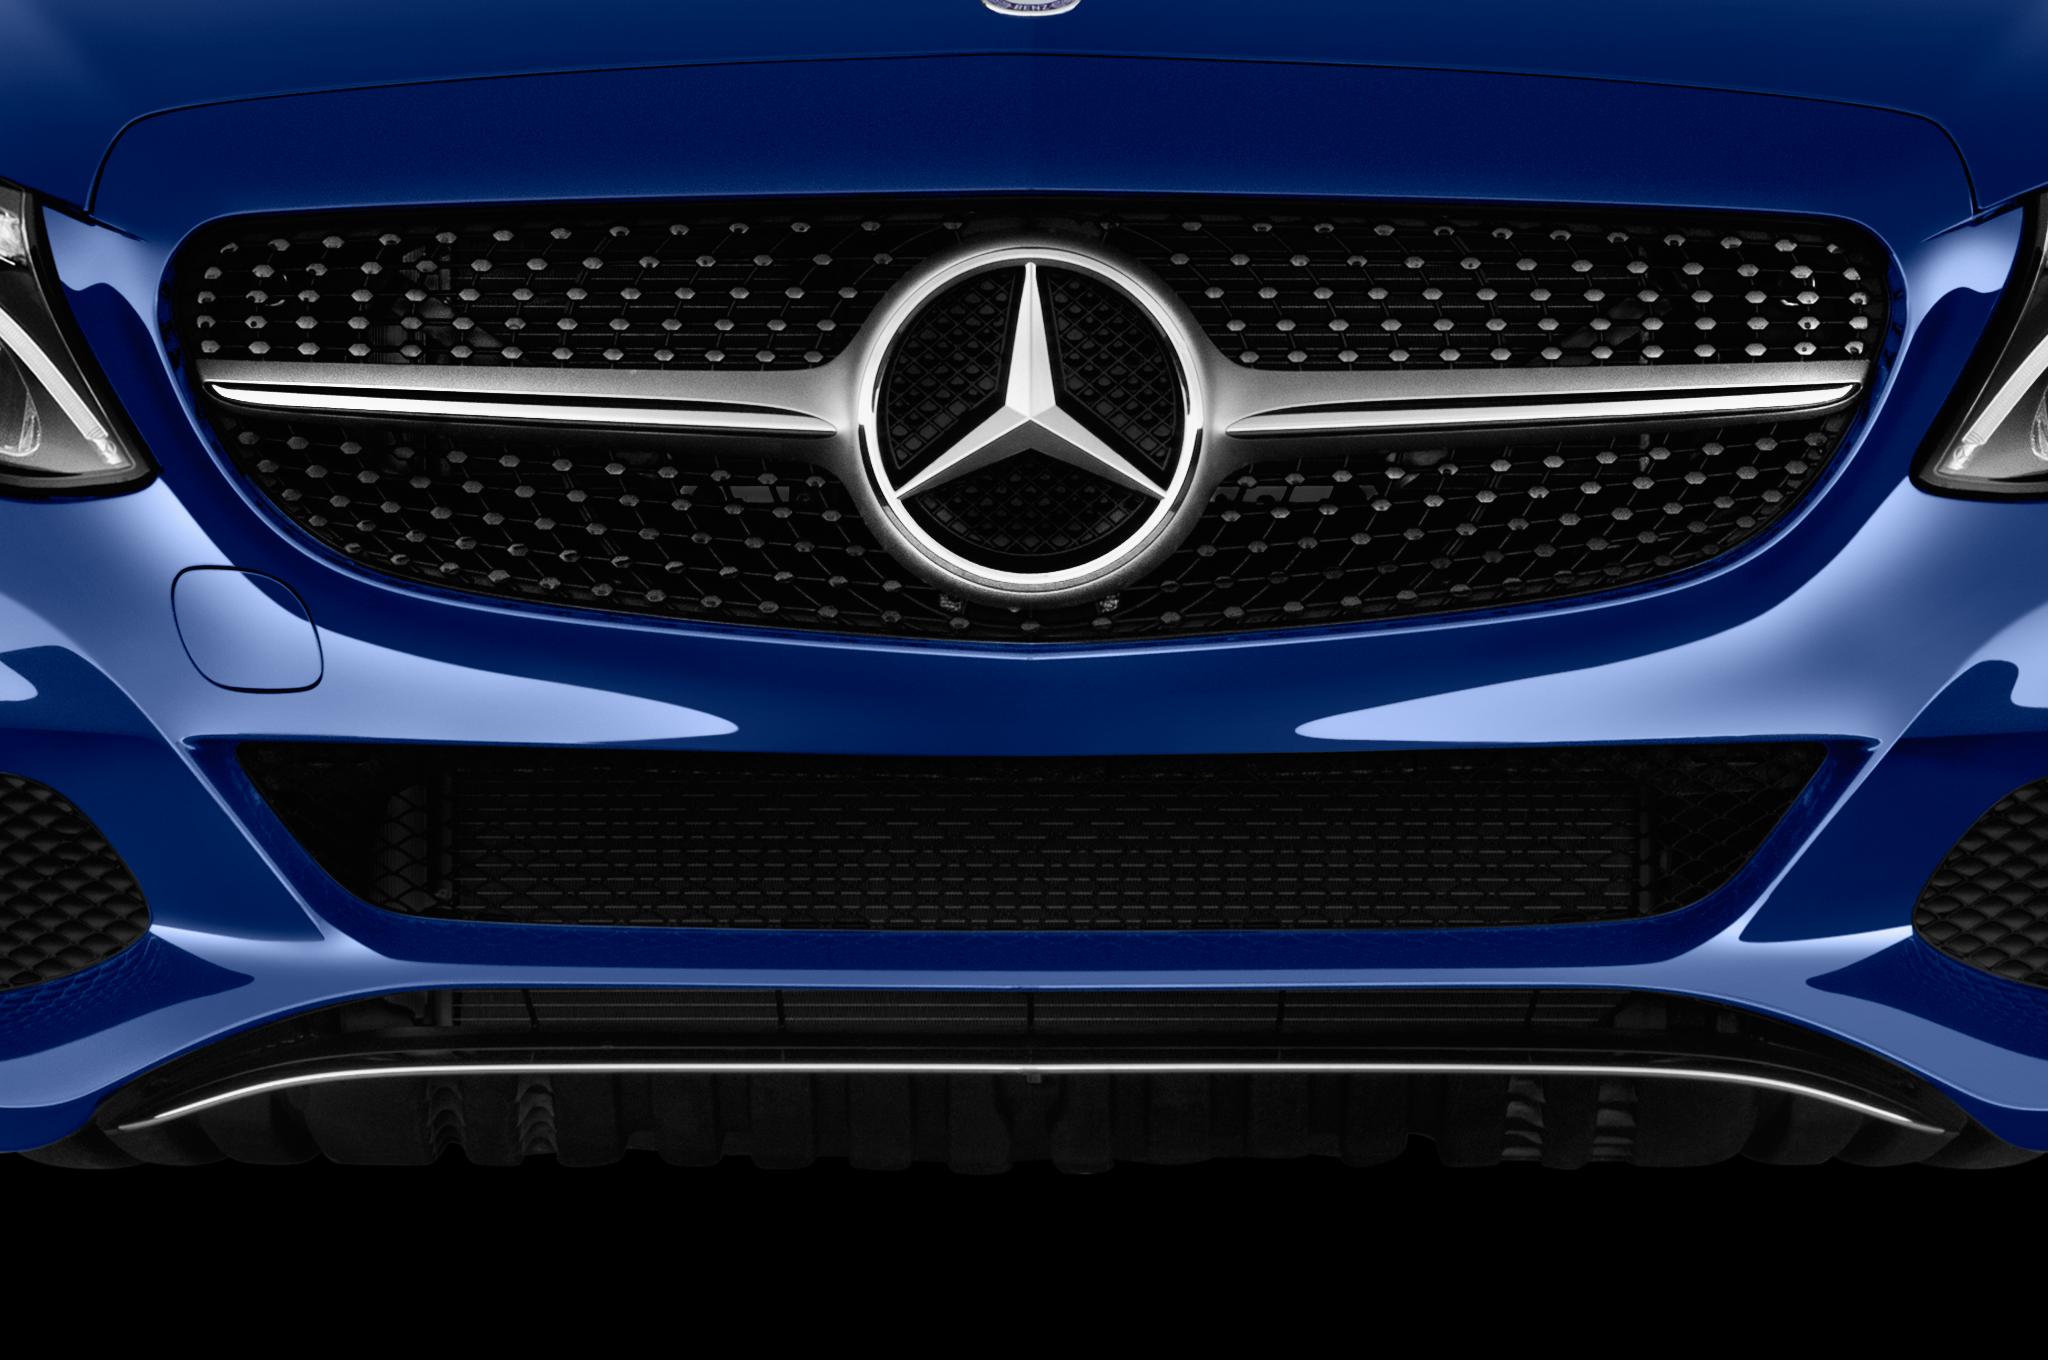 2017 Mercedes Amg C63 Cabriolet Revealed At 2016 New York